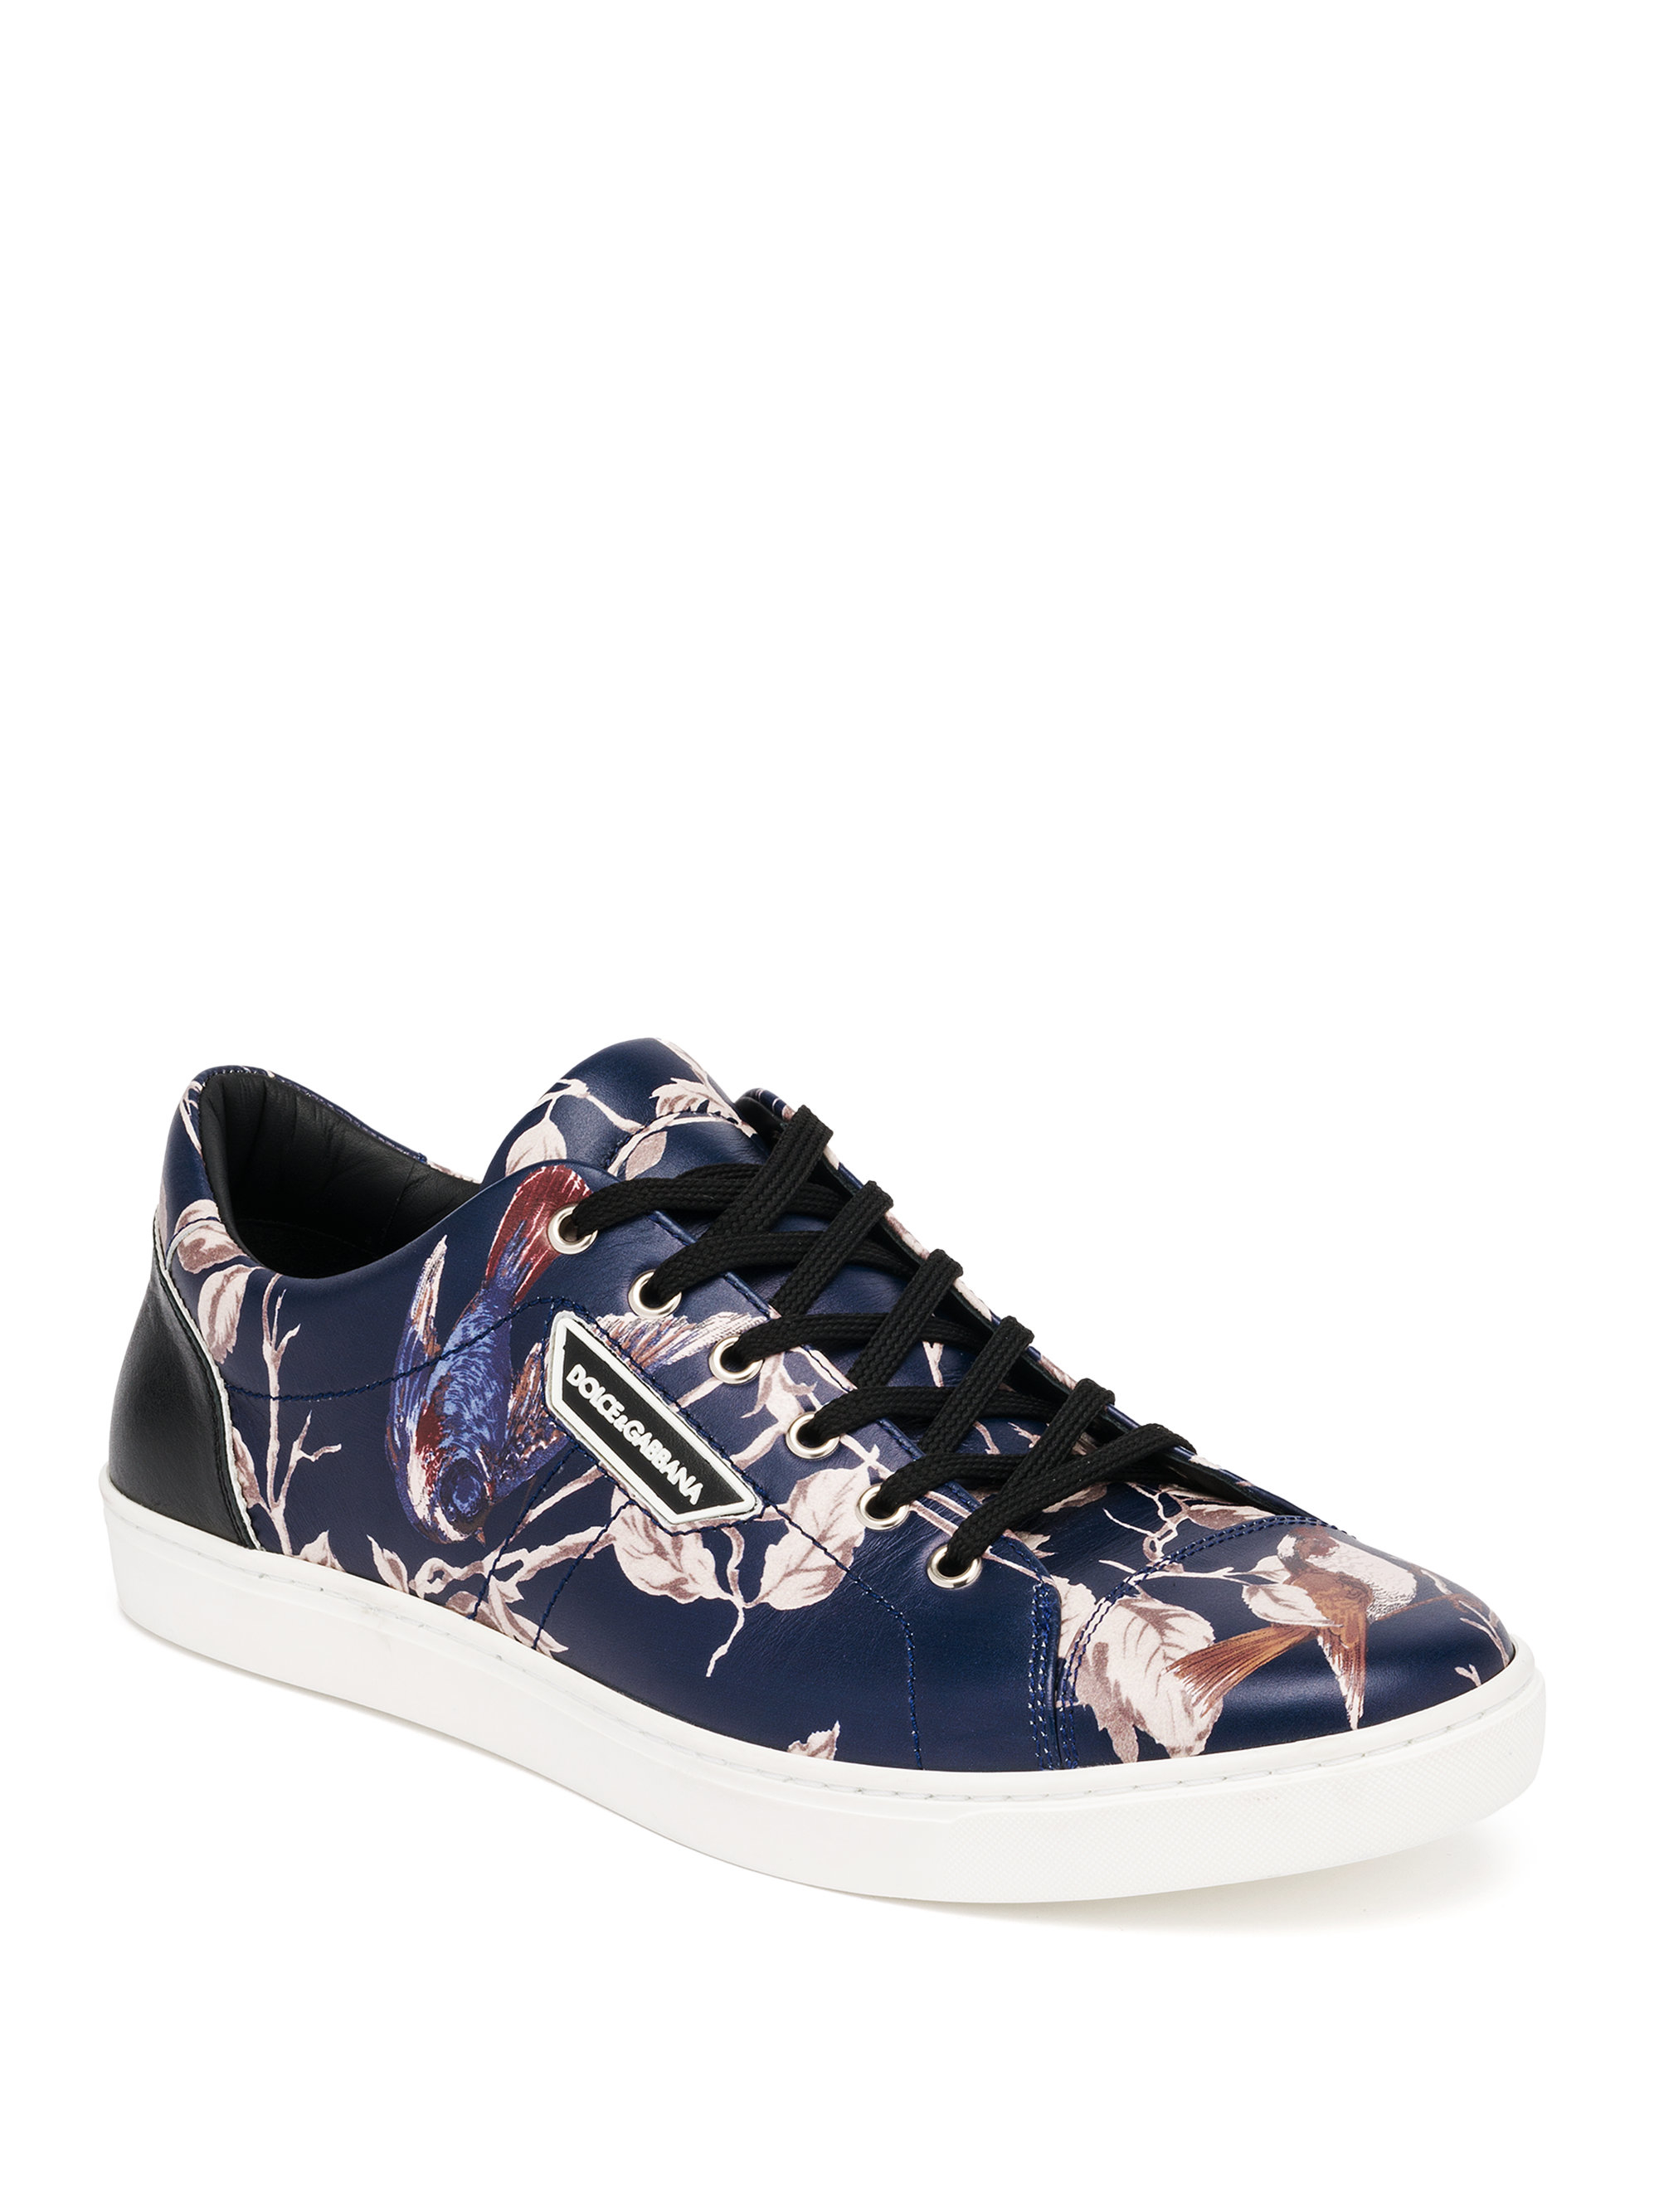 Dolce Amp Gabbana London Bird Print Sneakers For Men Lyst